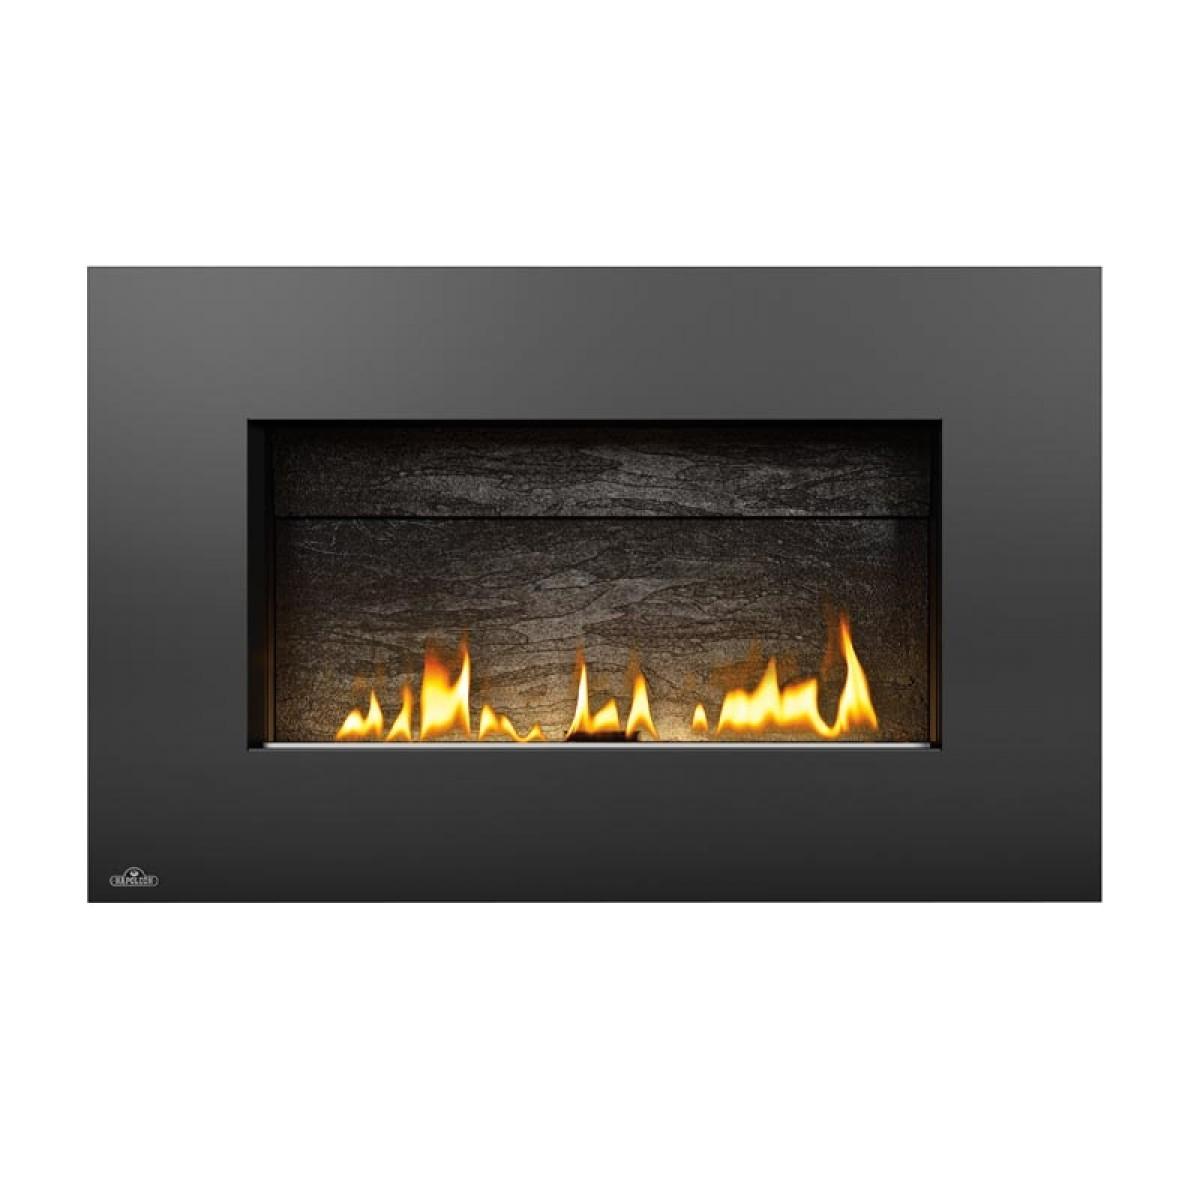 napoleon whvf31 plazmafire vent free gas fireplace w slate brick panel